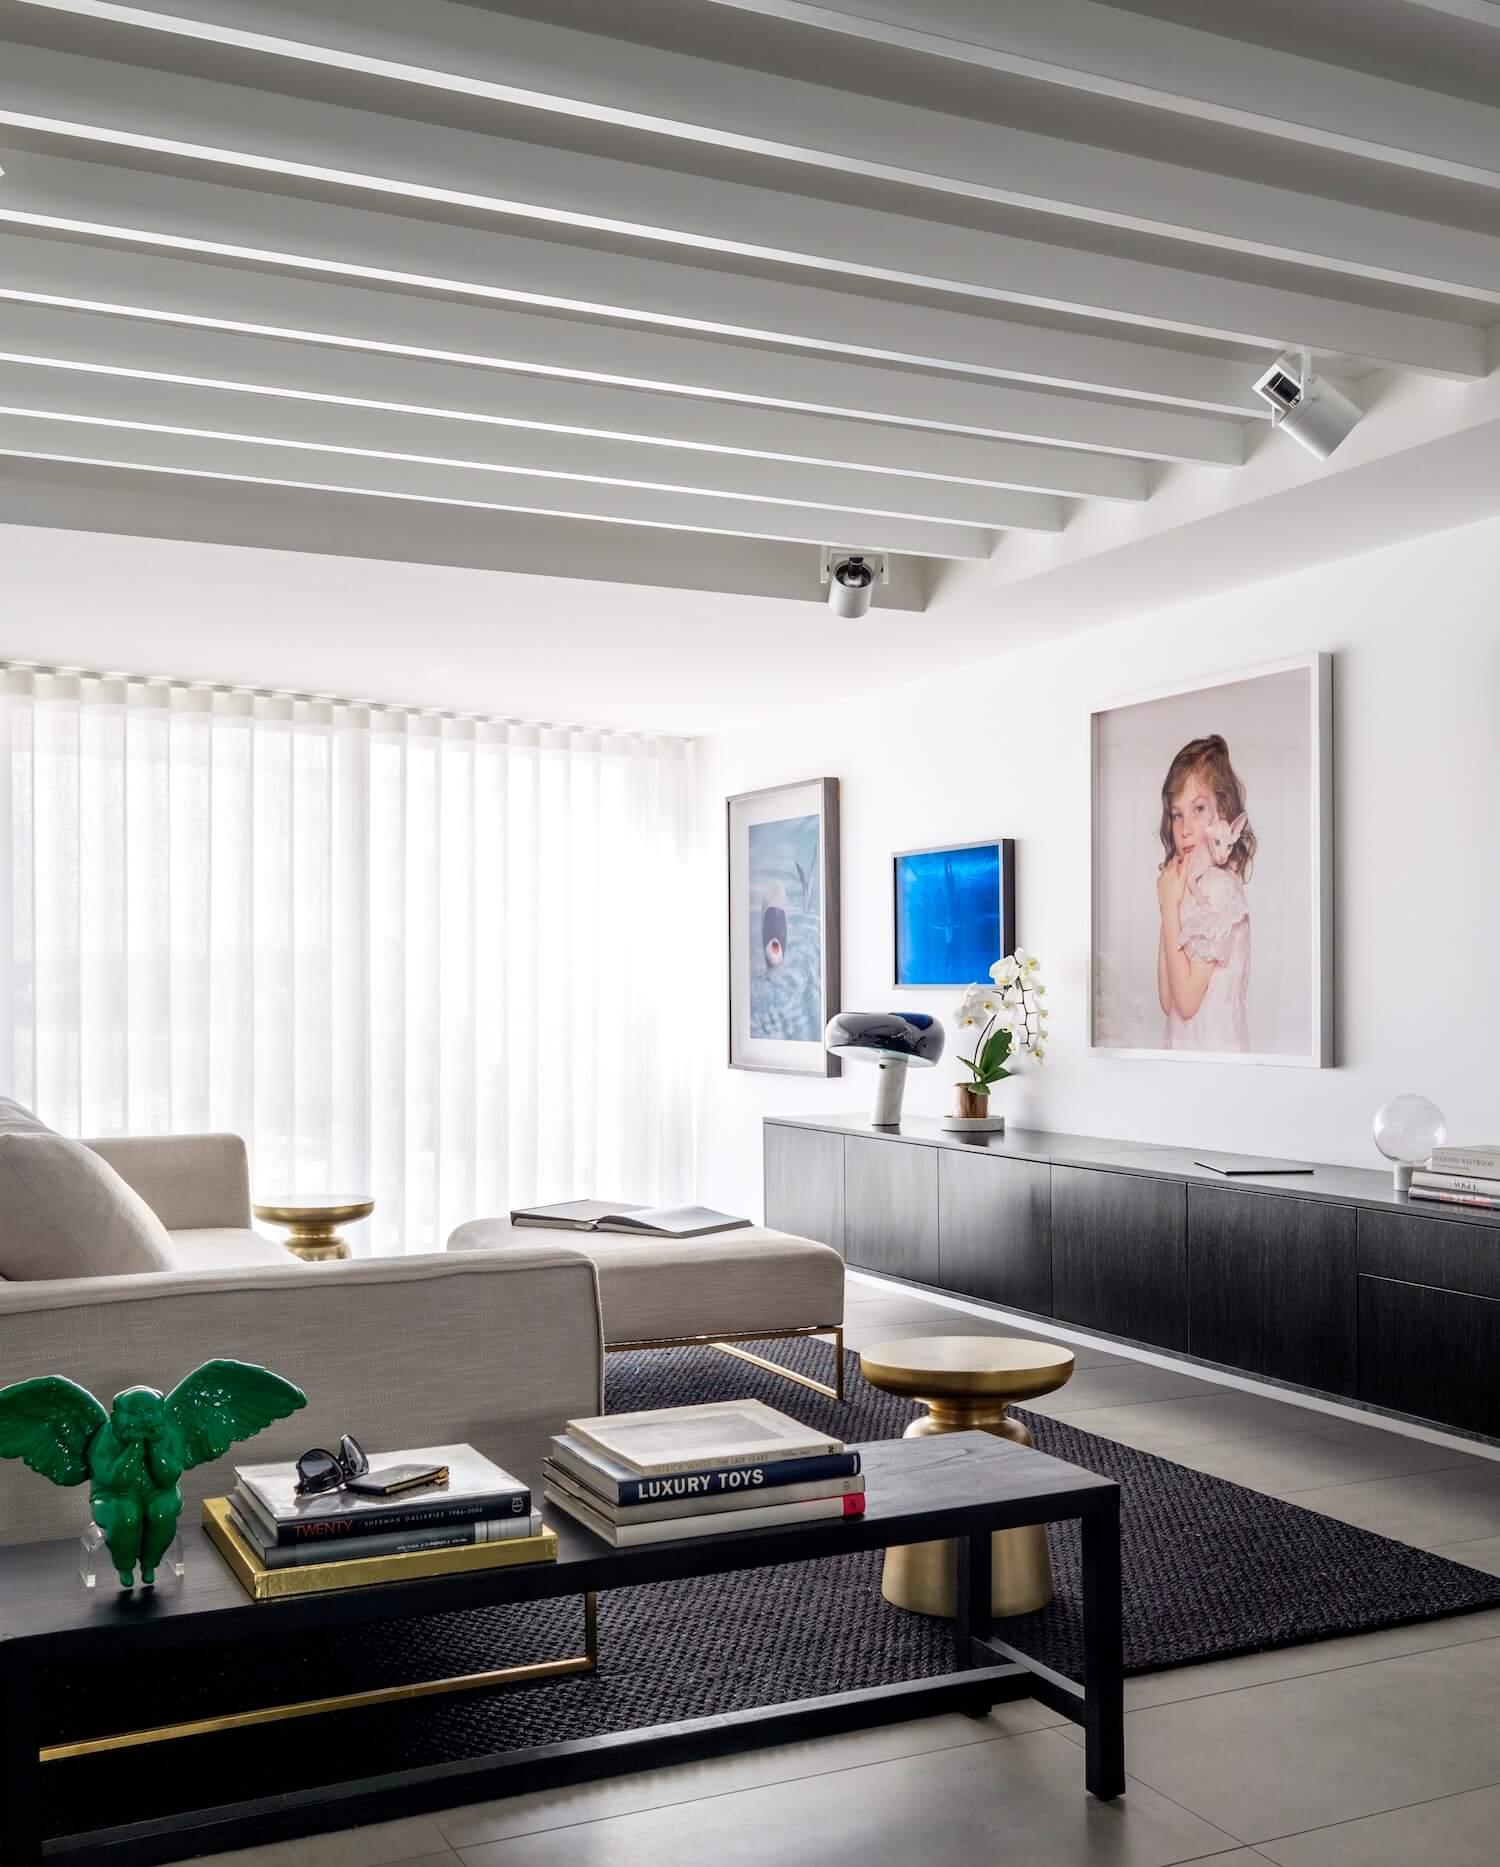 est living interiors lawless meyerson bondi apartment 3